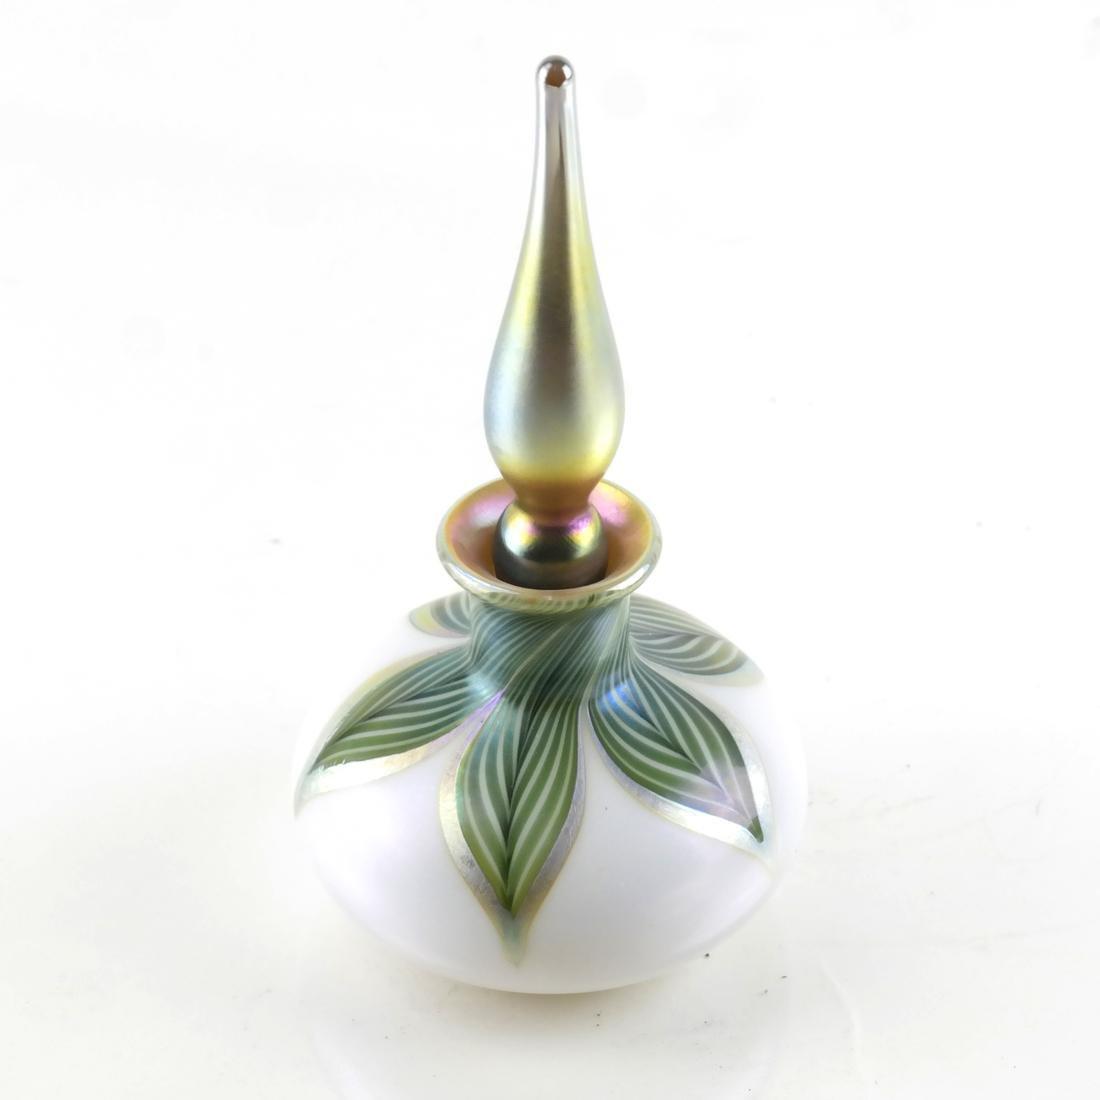 Lundberg Studios, Art Glass Scent Bottle with Stopper